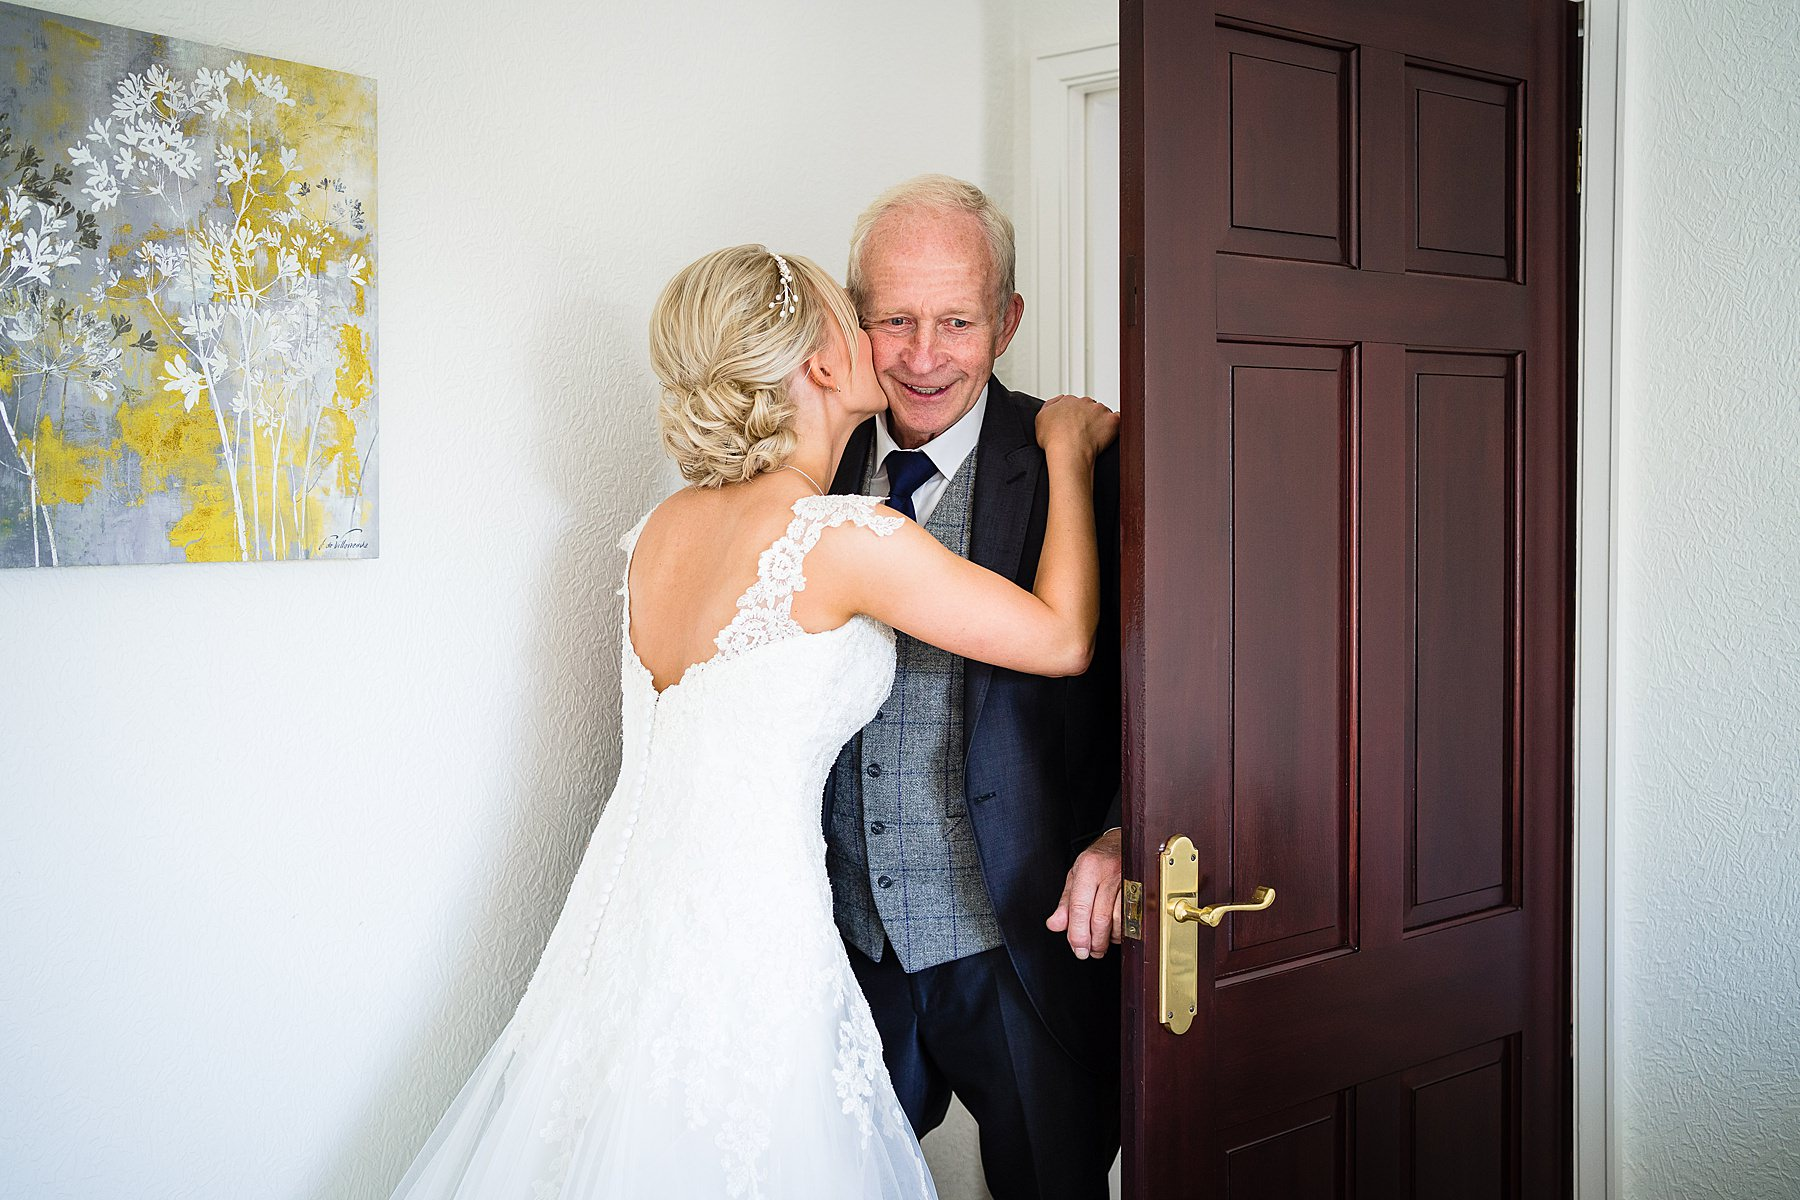 dad sees bride in dress